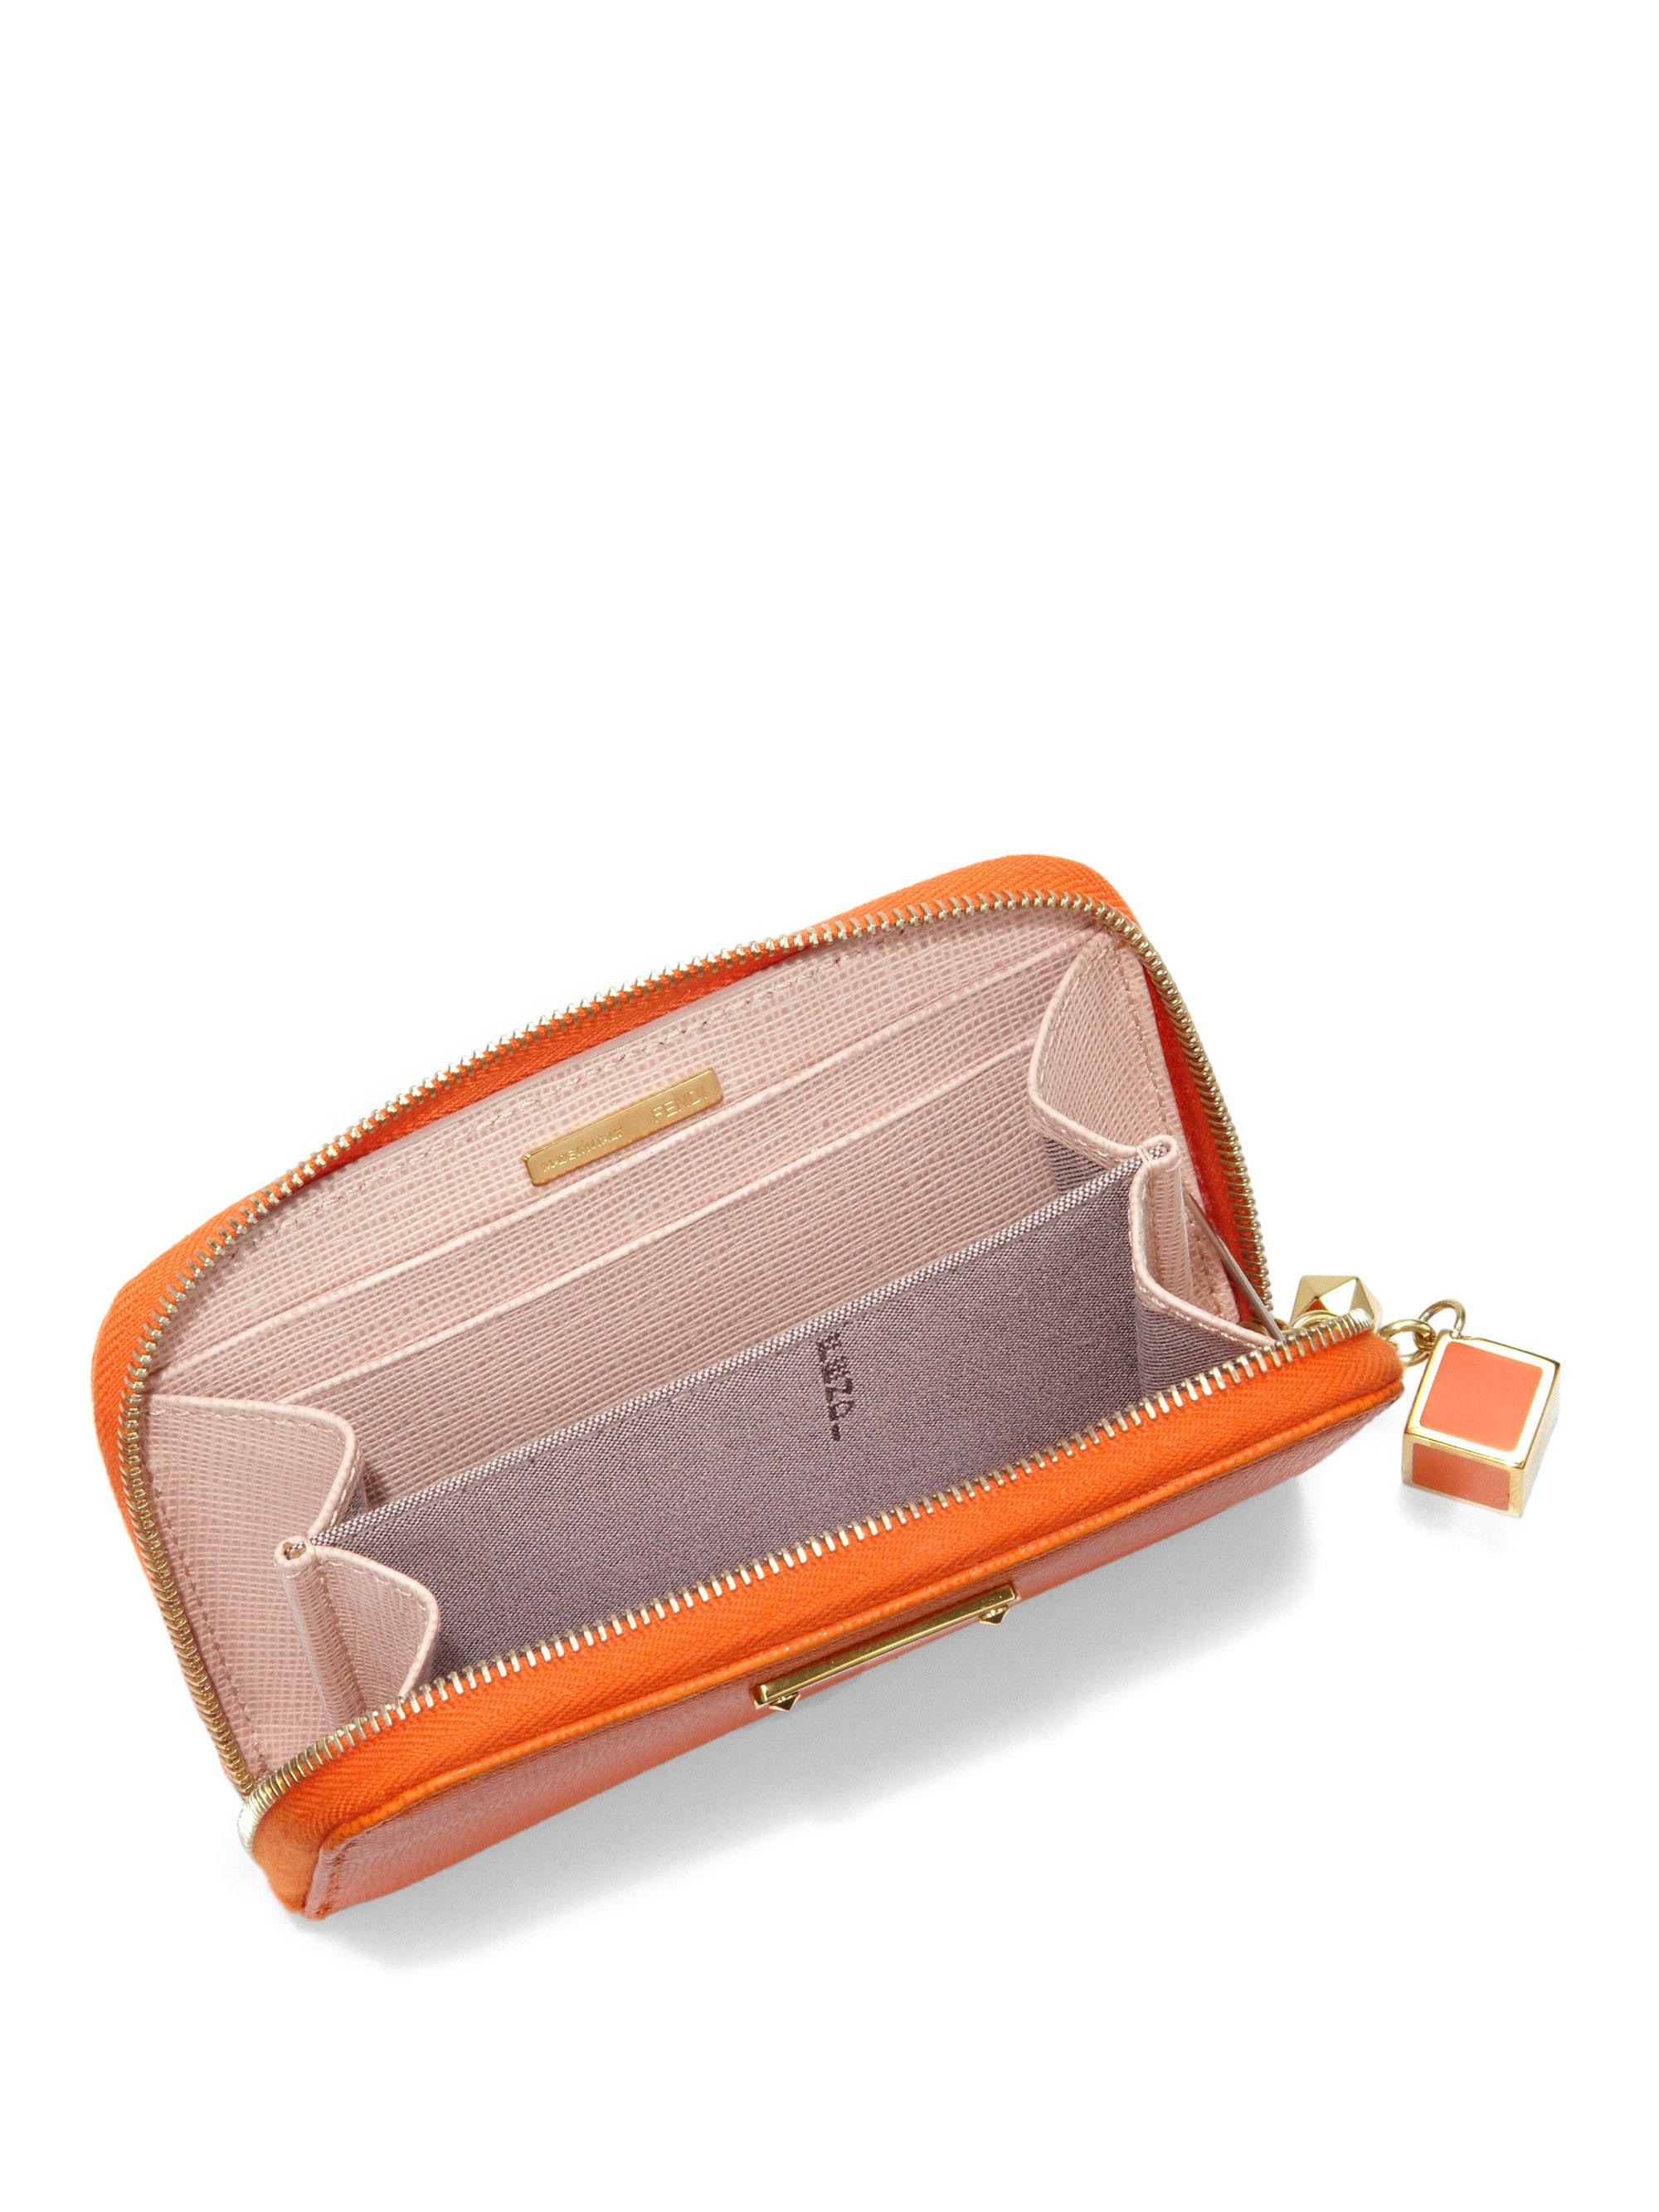 new arrival ba2b6 934c6 Fendi Orange Mini Saffiano Zip-around Card Case